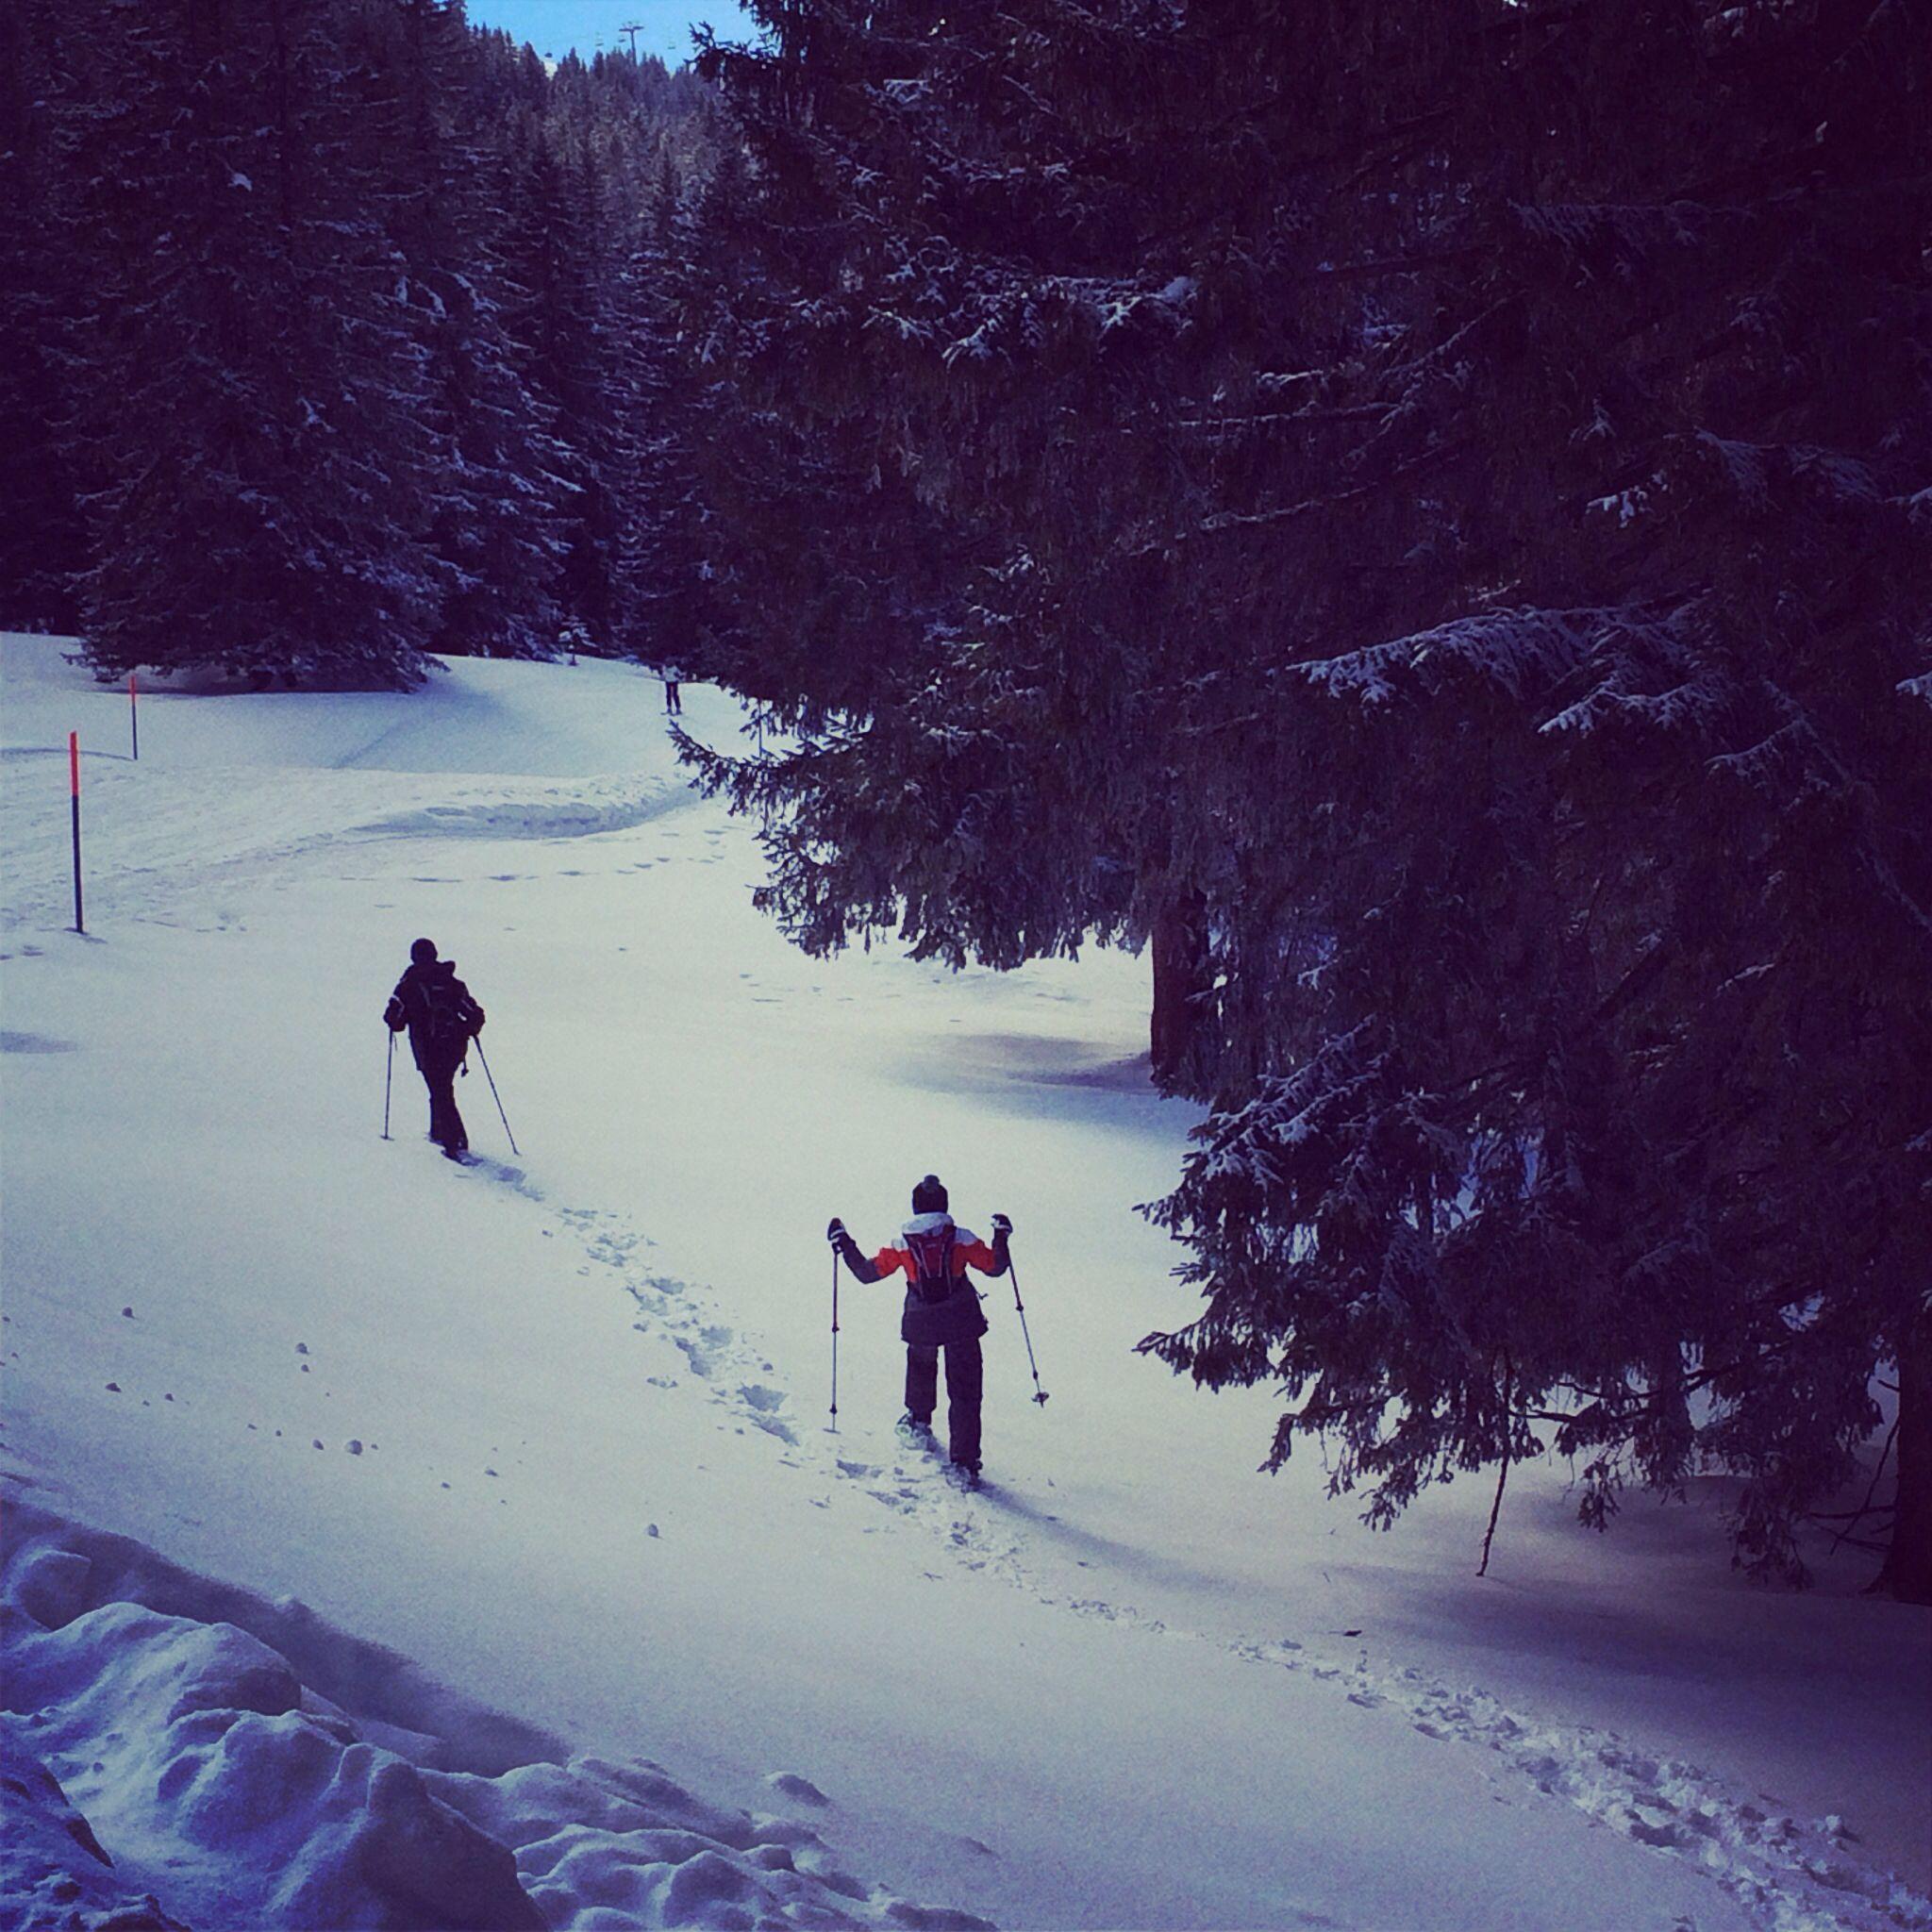 #swissheidiland#flumserberg#snowshoehiking